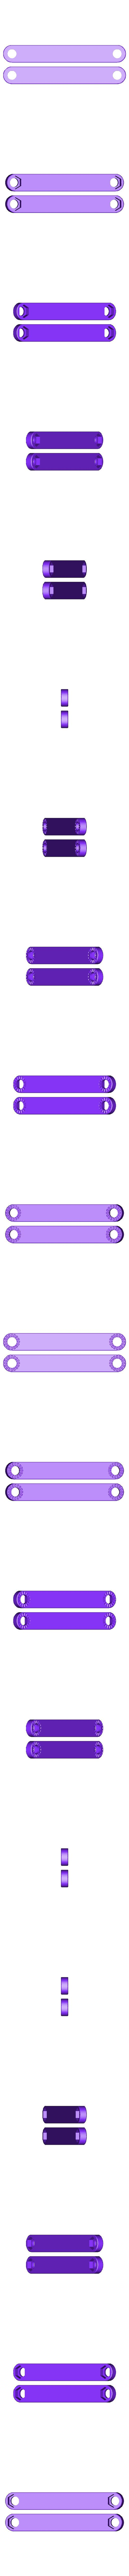 Arm Extender A v1.stl Télécharger fichier STL gratuit LiftPod - Support pliable multifonctionnel • Objet à imprimer en 3D, HeyVye